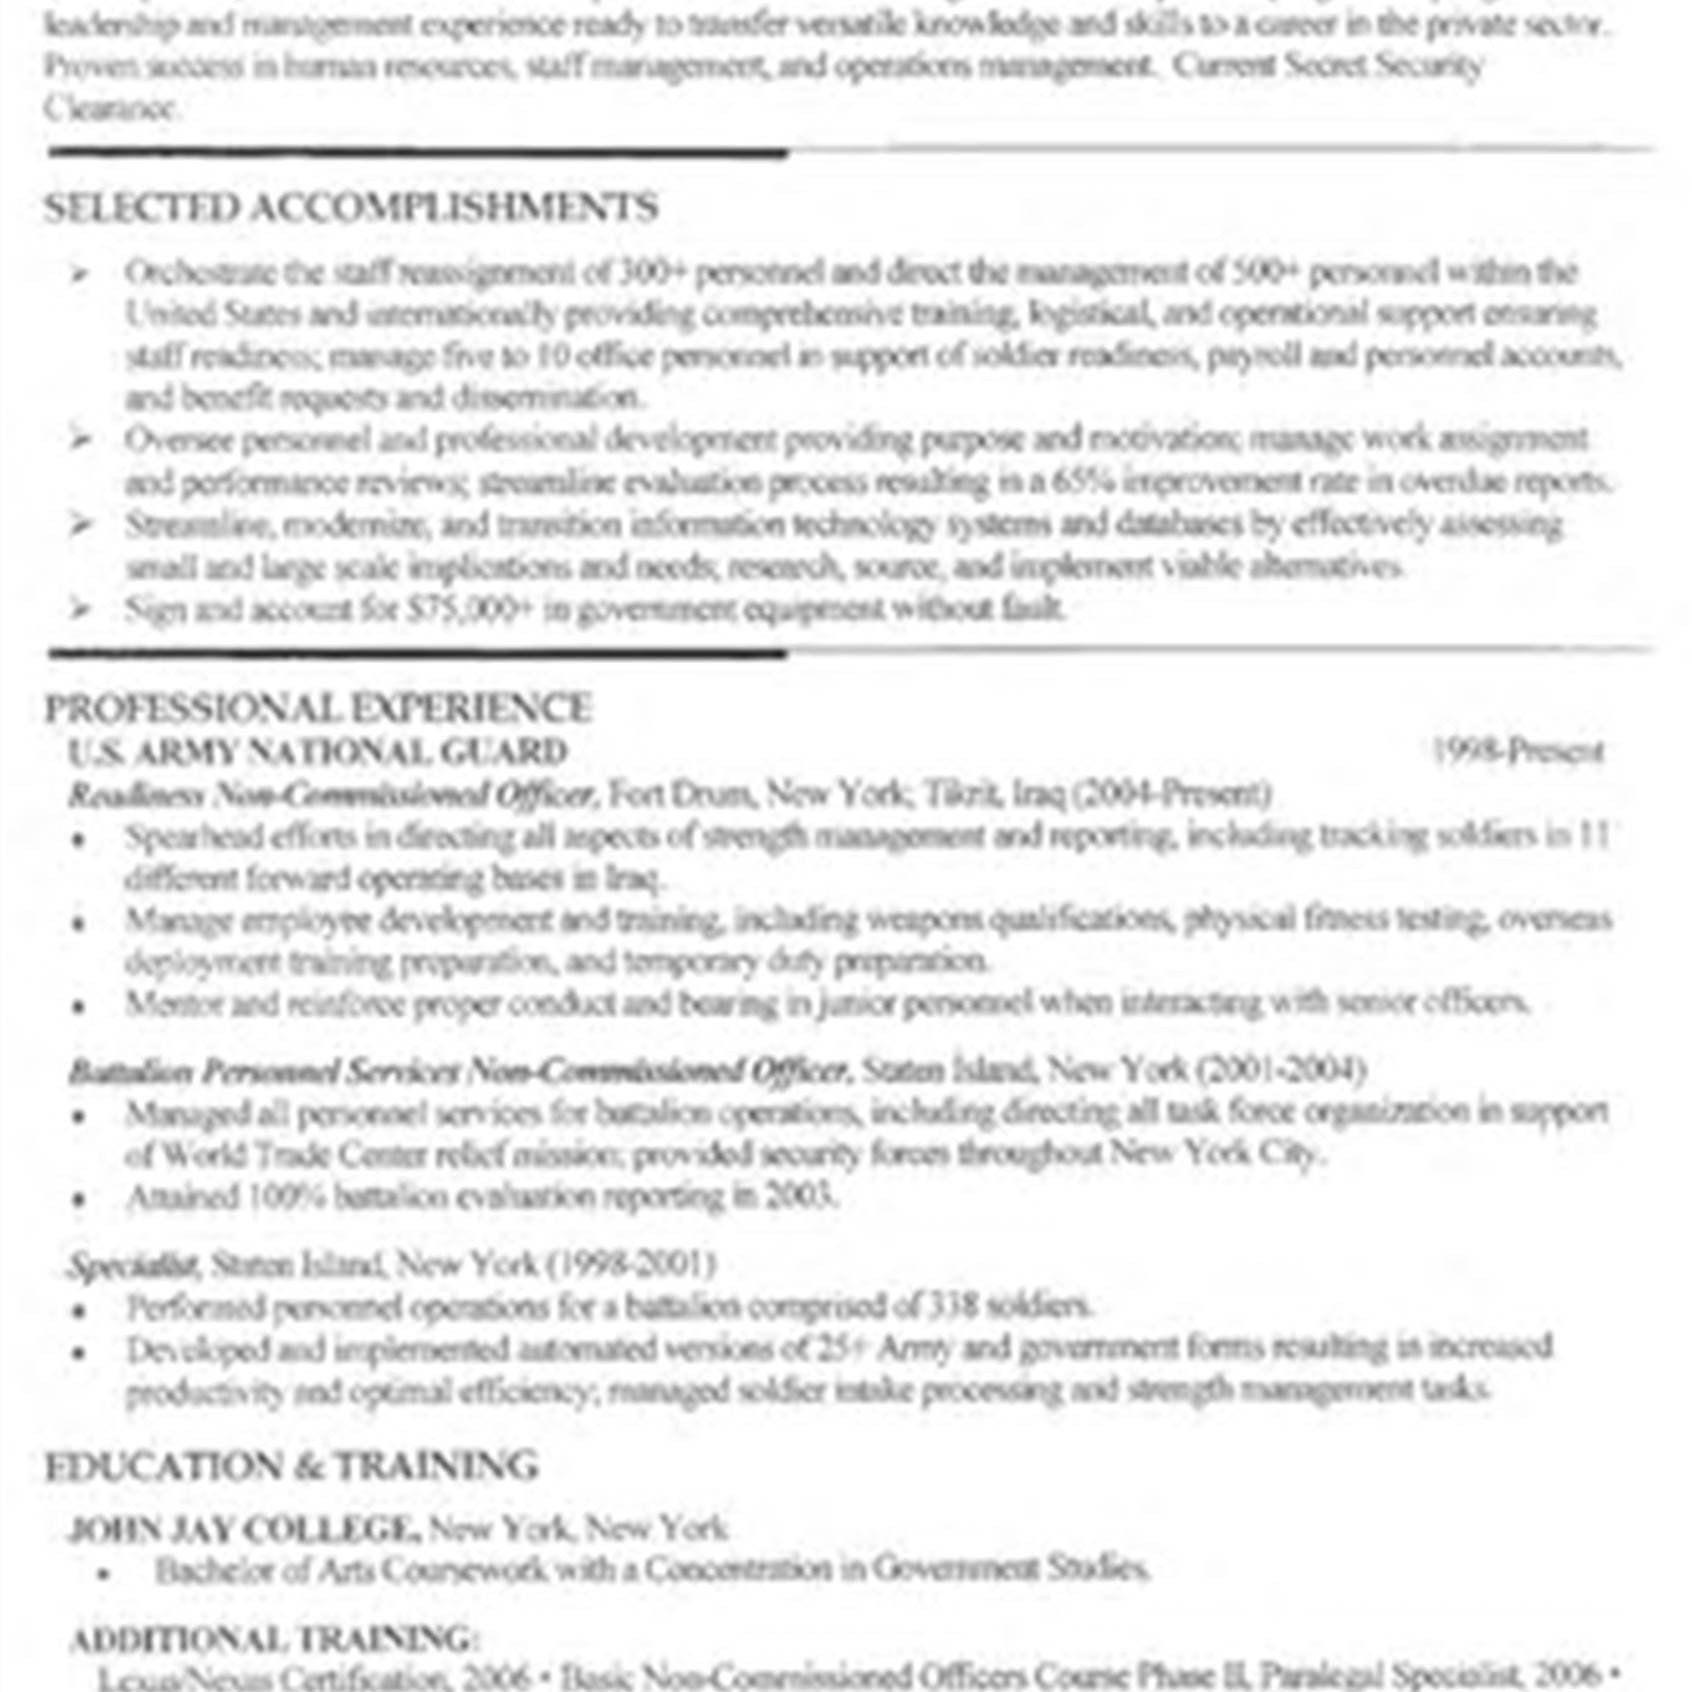 Resume Printing Services Near Me